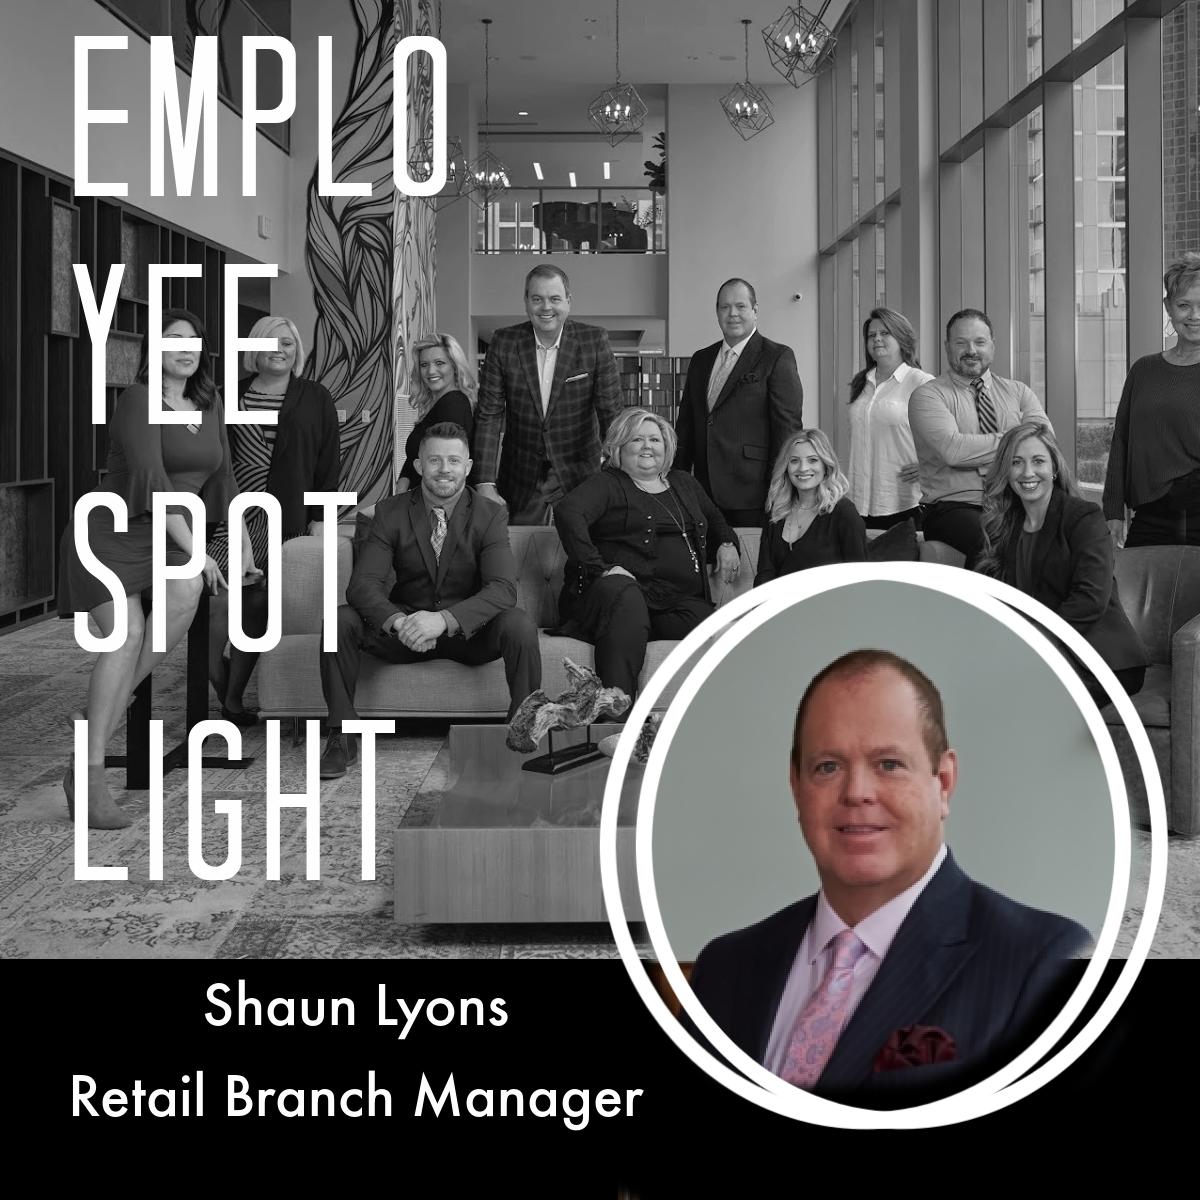 Employee Spotlight of Shaun Lyons